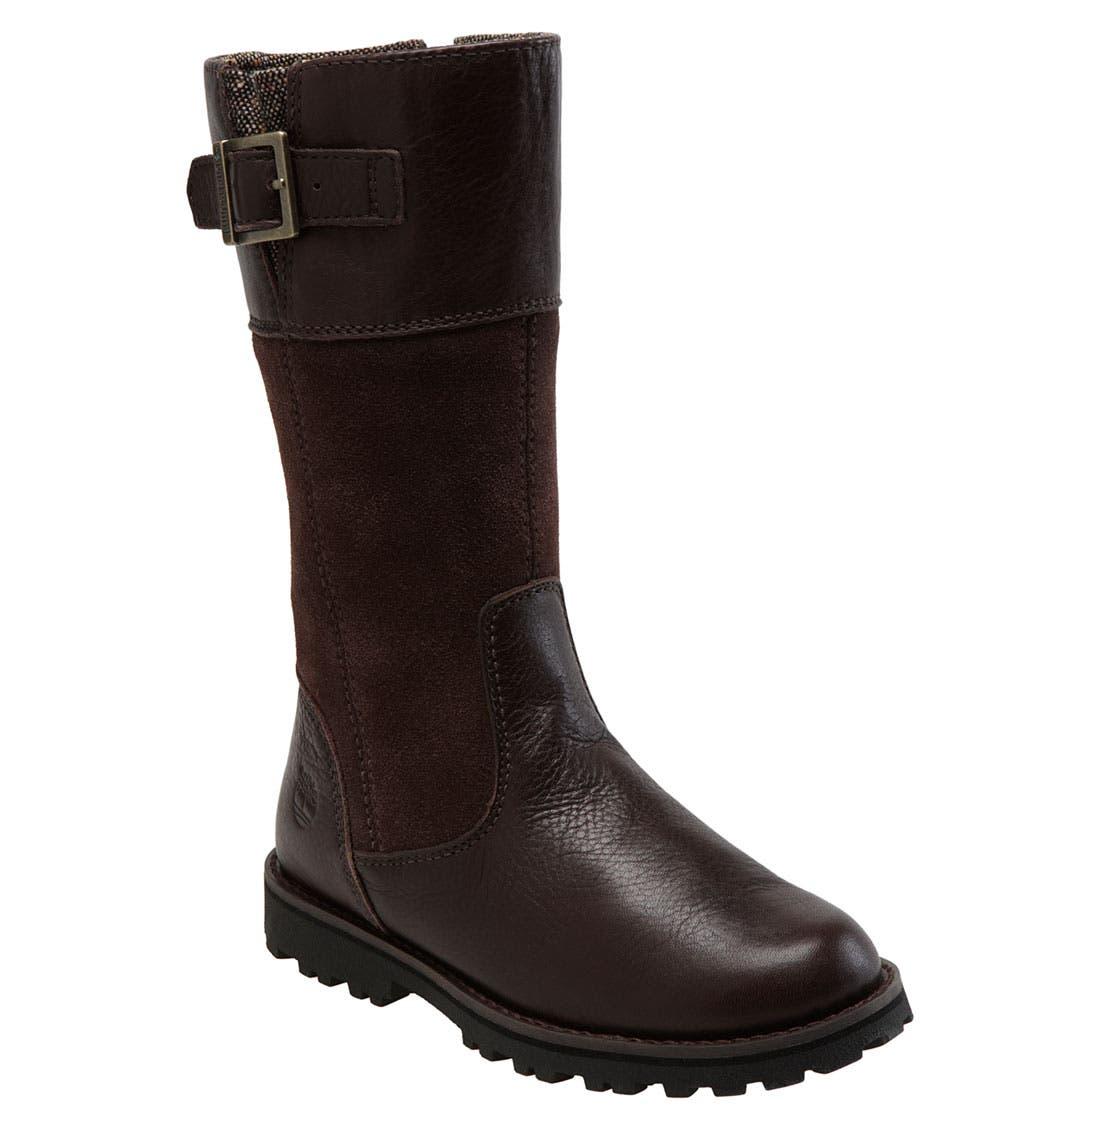 Main Image - Timberland 'Maplebrook' Tall Boot (Walker, Toddler, Little Kid & Big Kid)